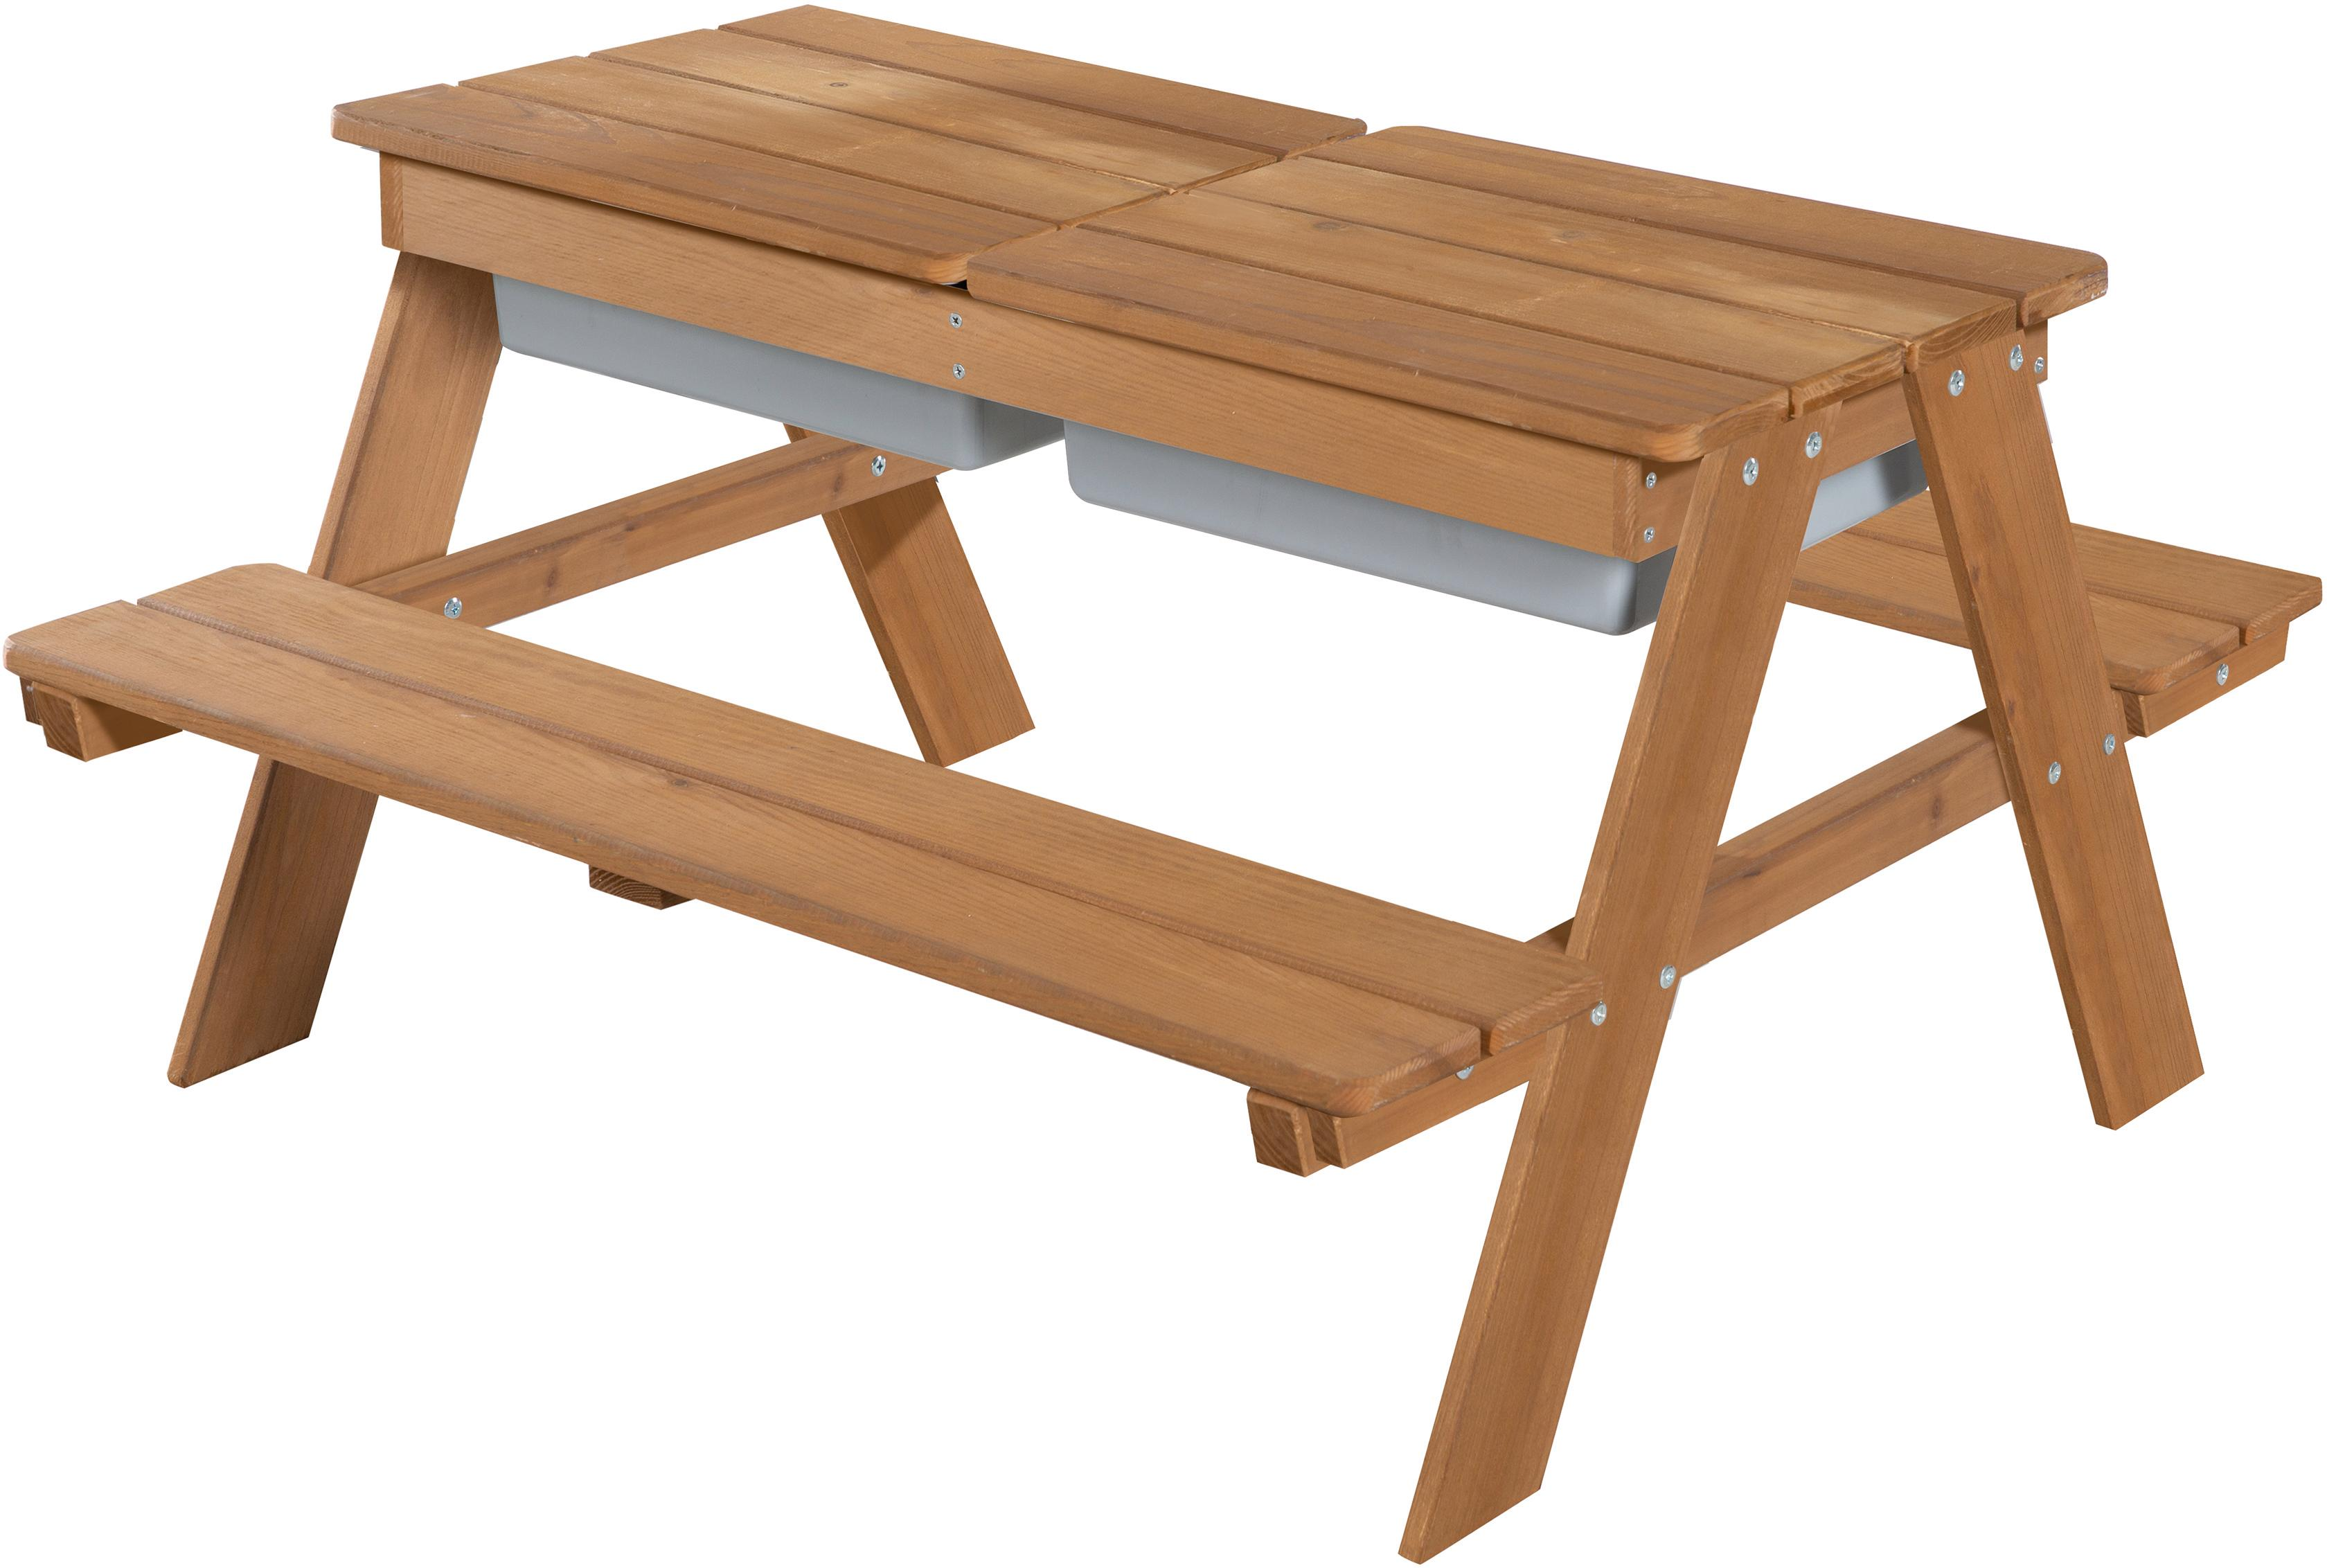 roba Kindersitzgruppe Outdoor Deluxe mit Spielwannenm Teakholz, (Set, 1 tlg.) braun Kinder Kinderstühle Kindermöbel